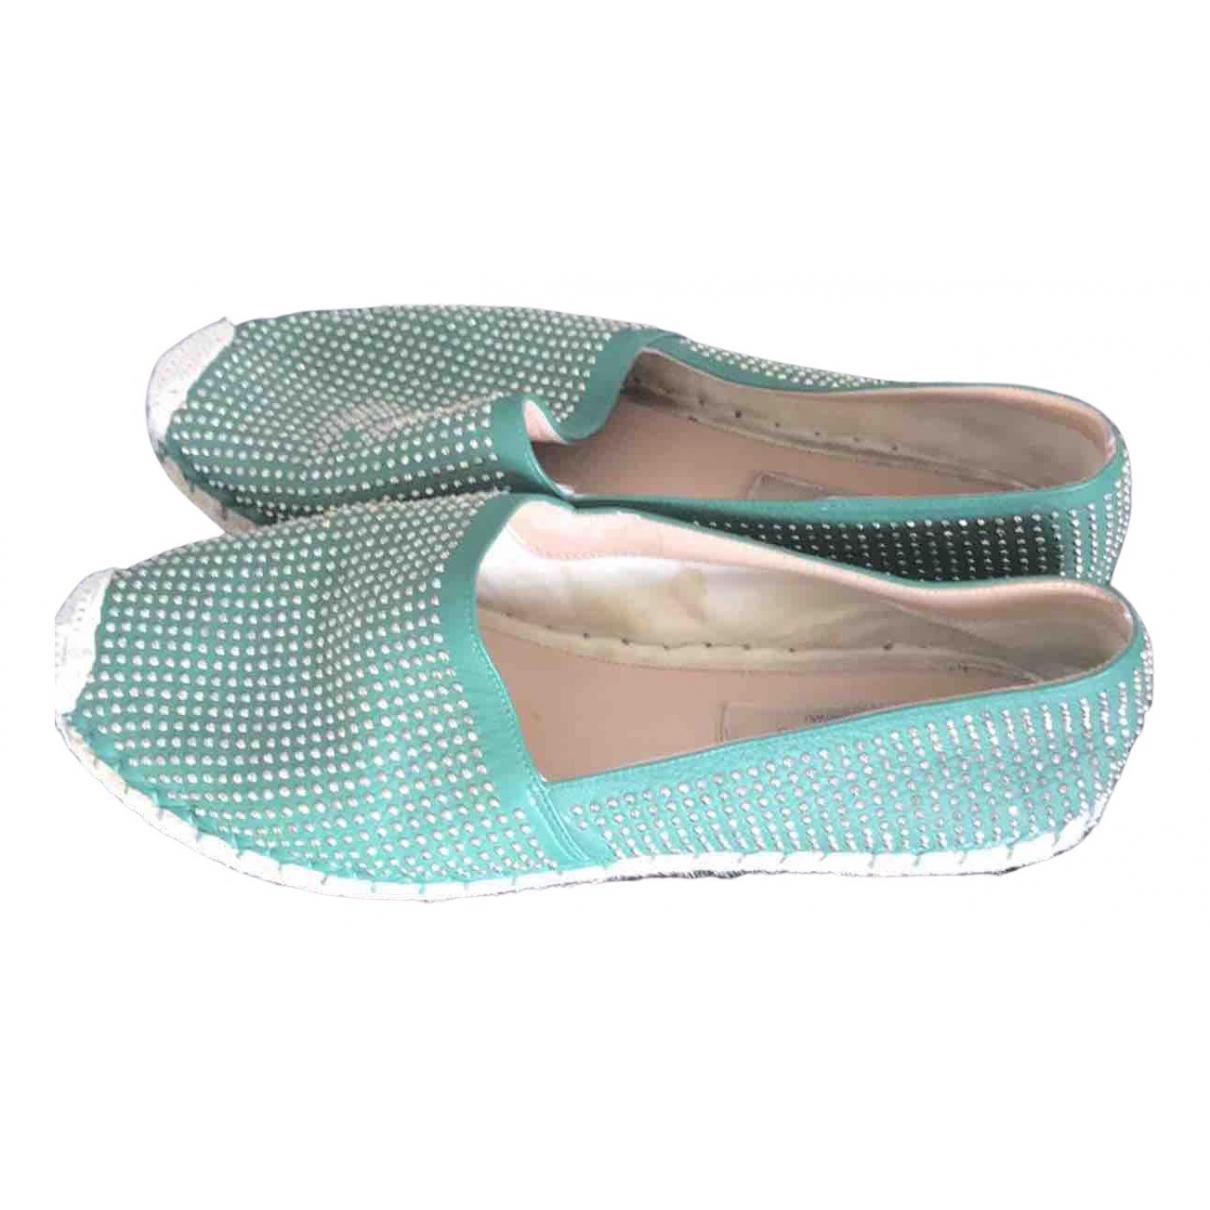 Valentino Garavani \N Green Leather Espadrilles for Women 38 EU